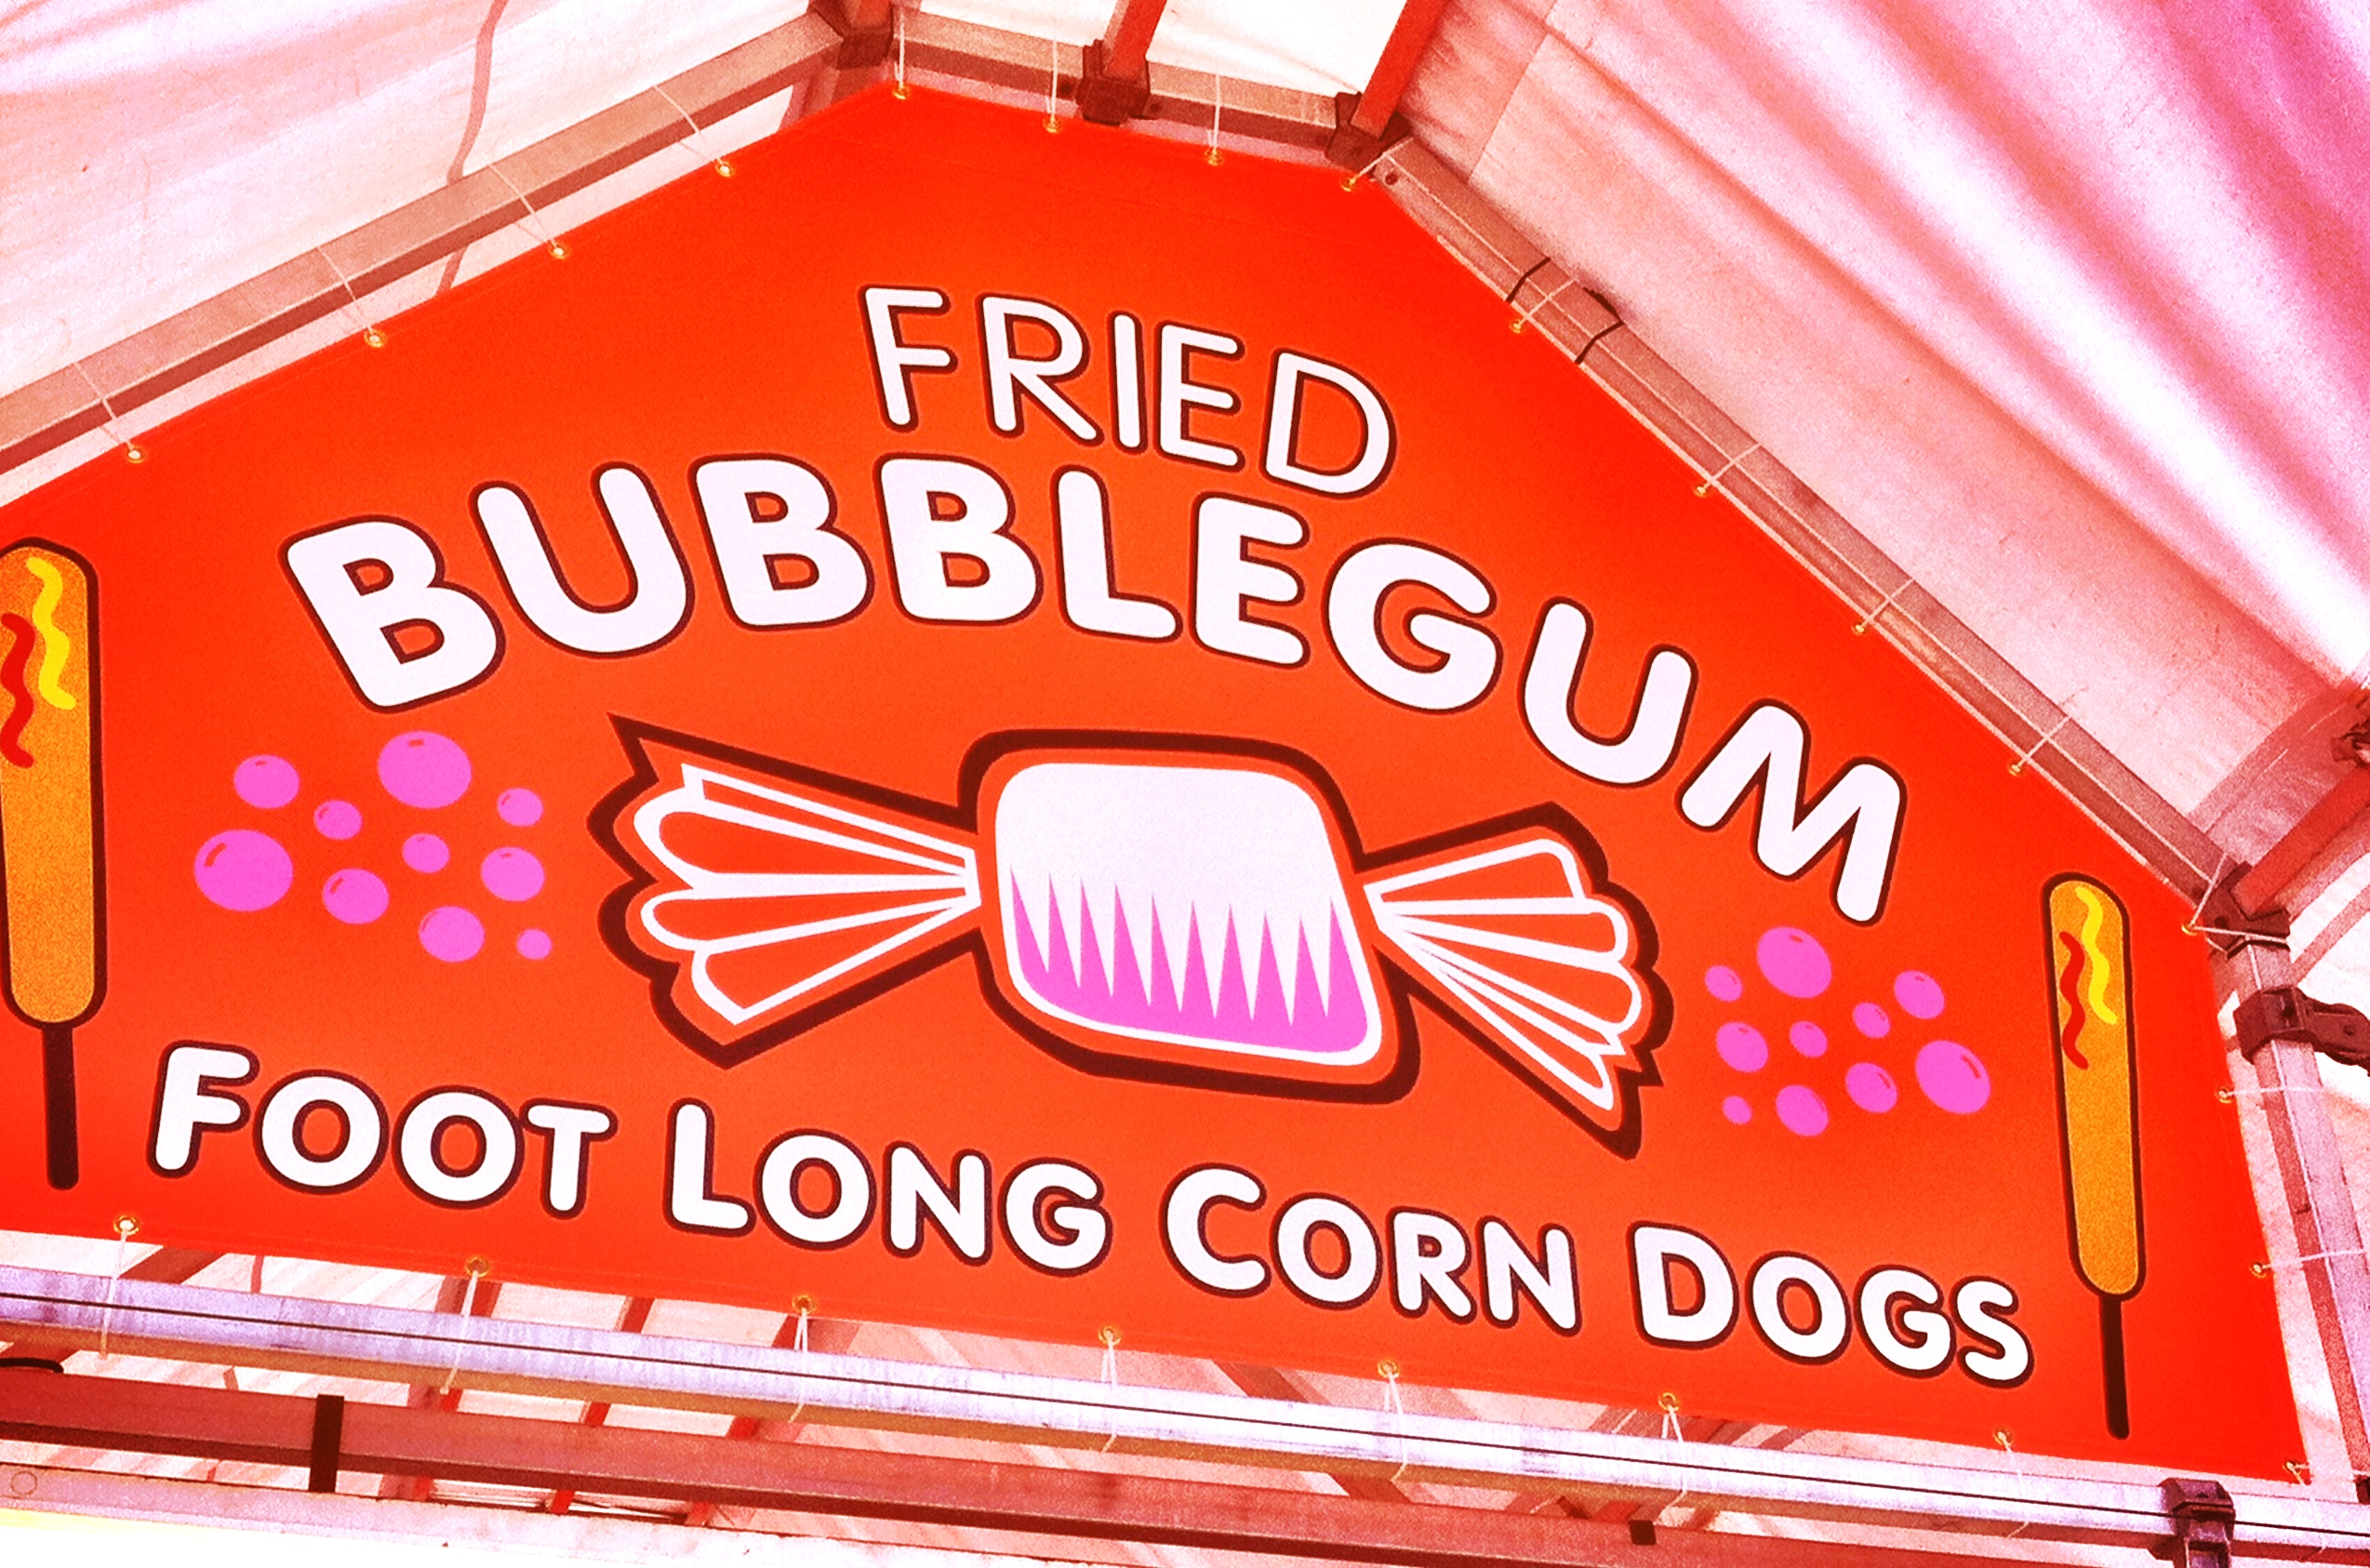 Deep Fried Bubblegum thesweetwanderlust.com